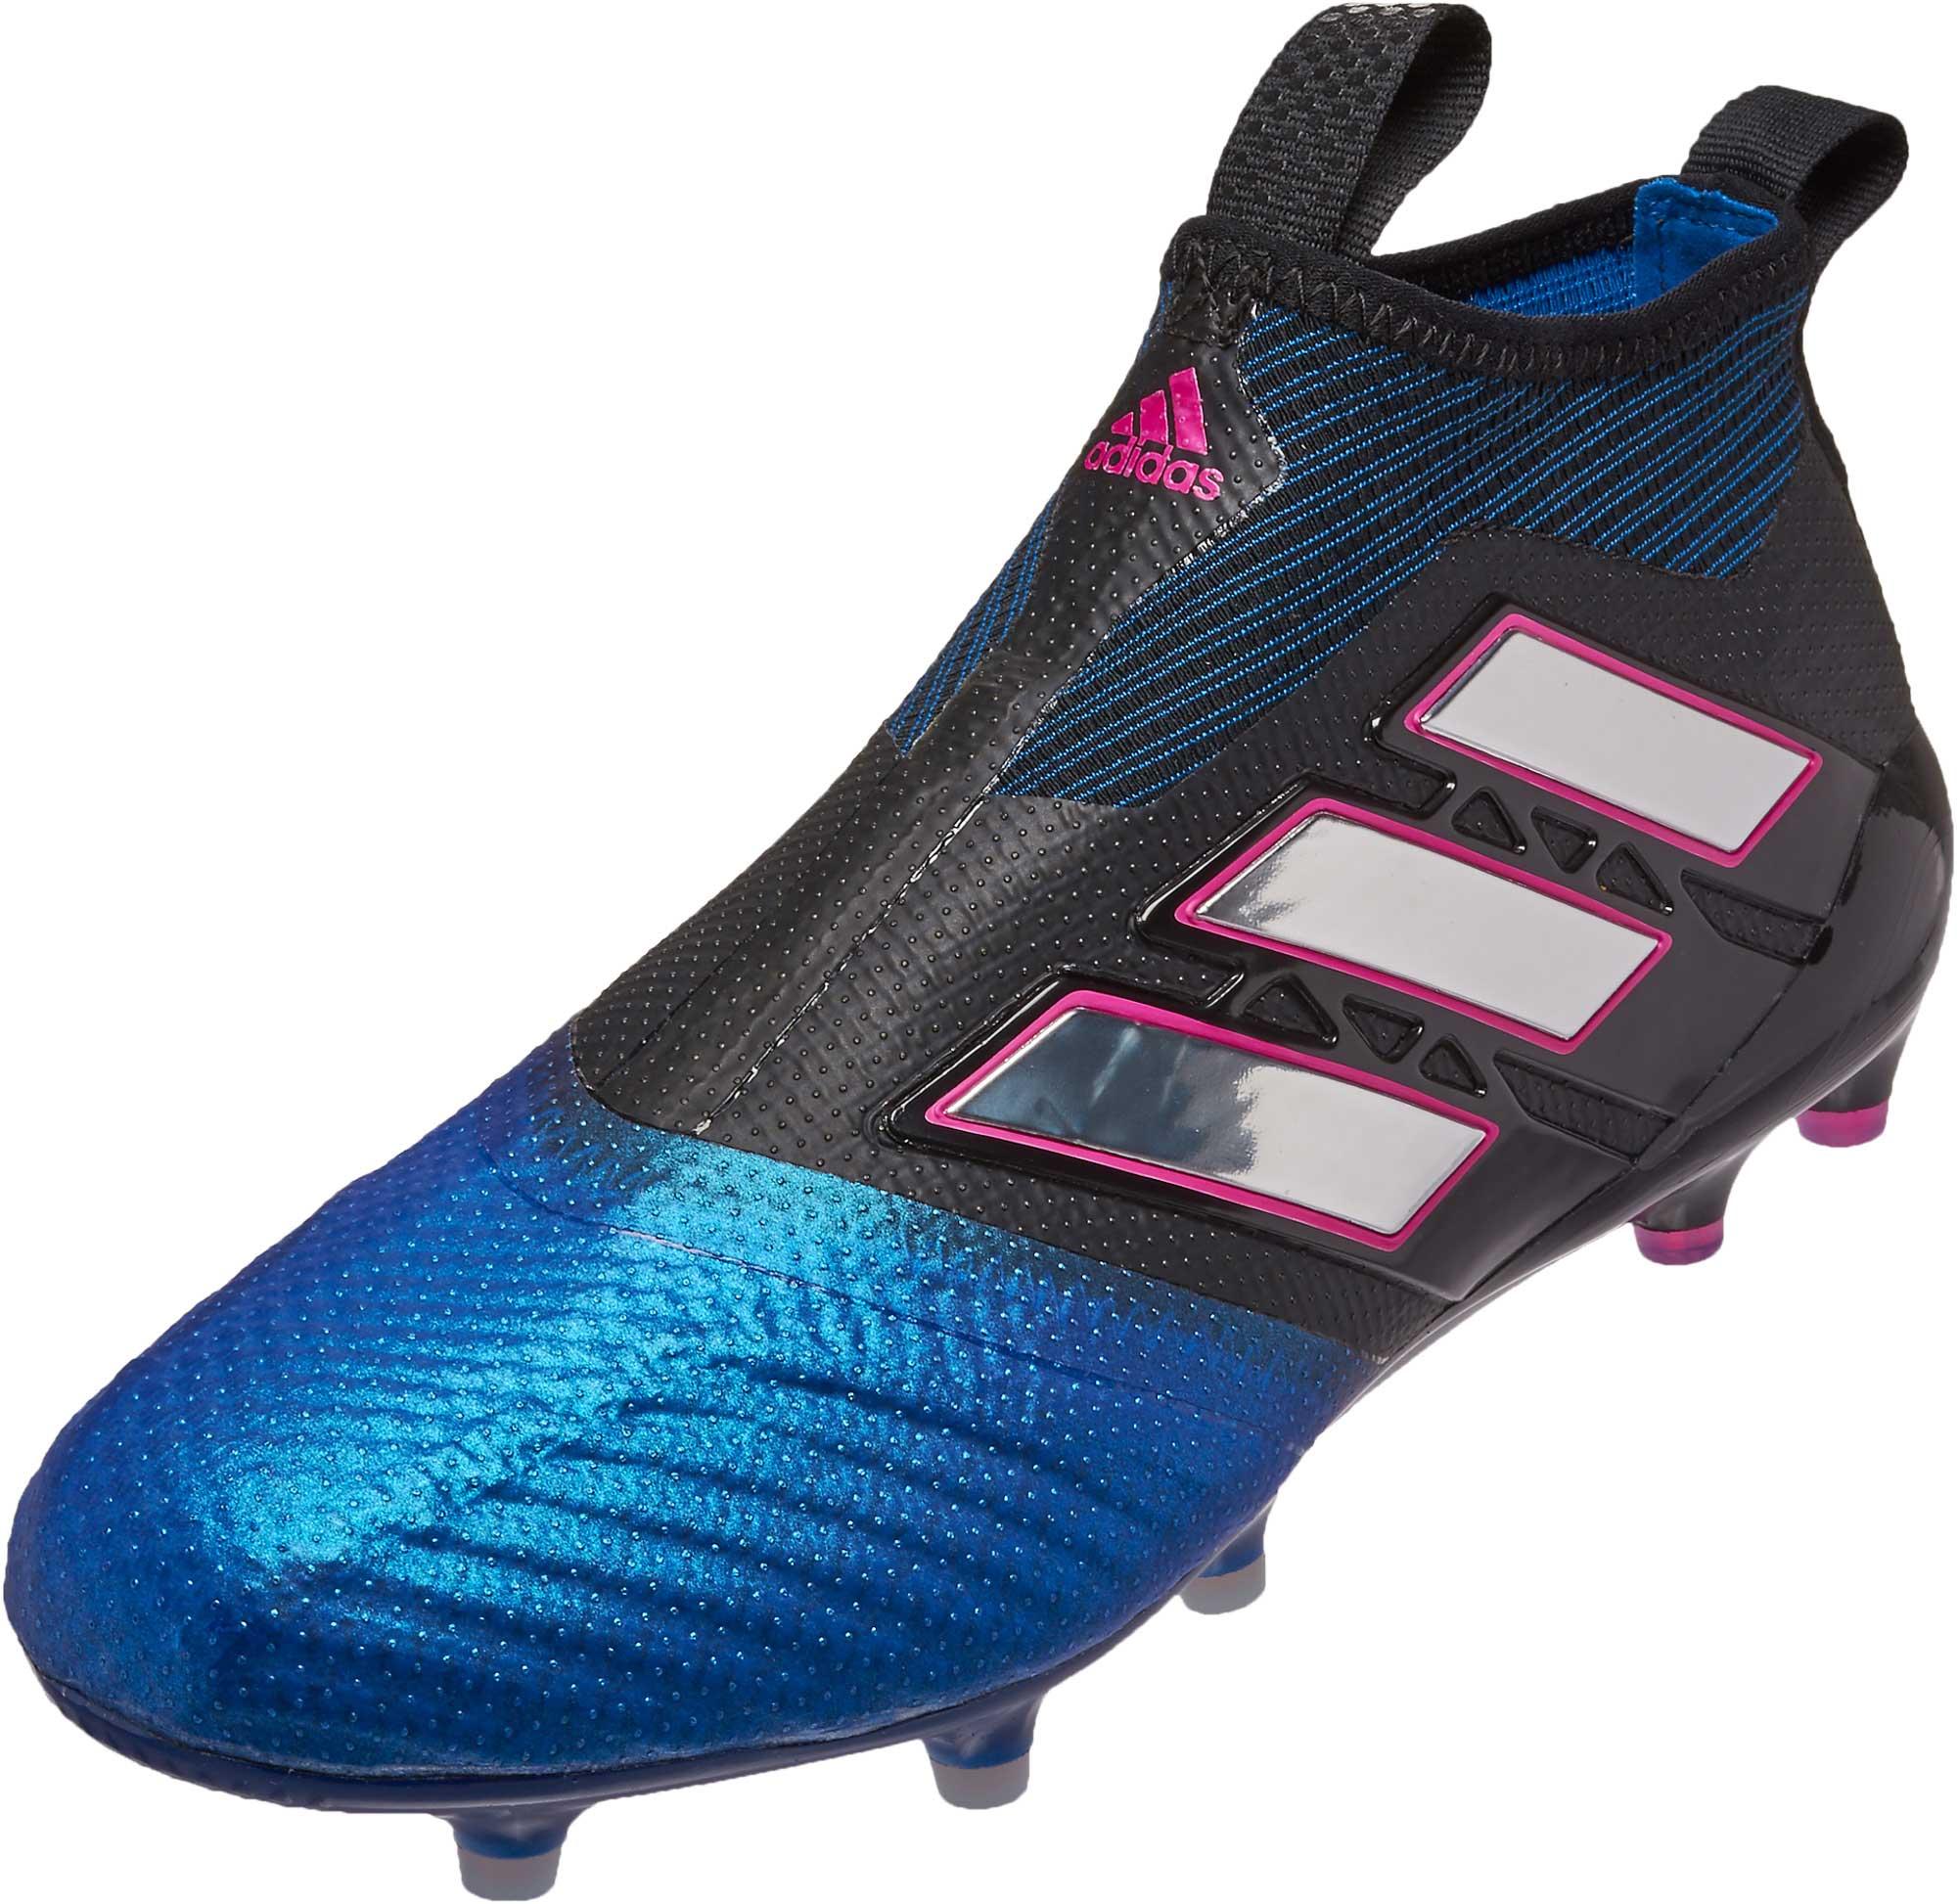 save off e4bce 99e8c adidas ACE 17+ Purecontrol FG Soccer Cleats – Black   Blue